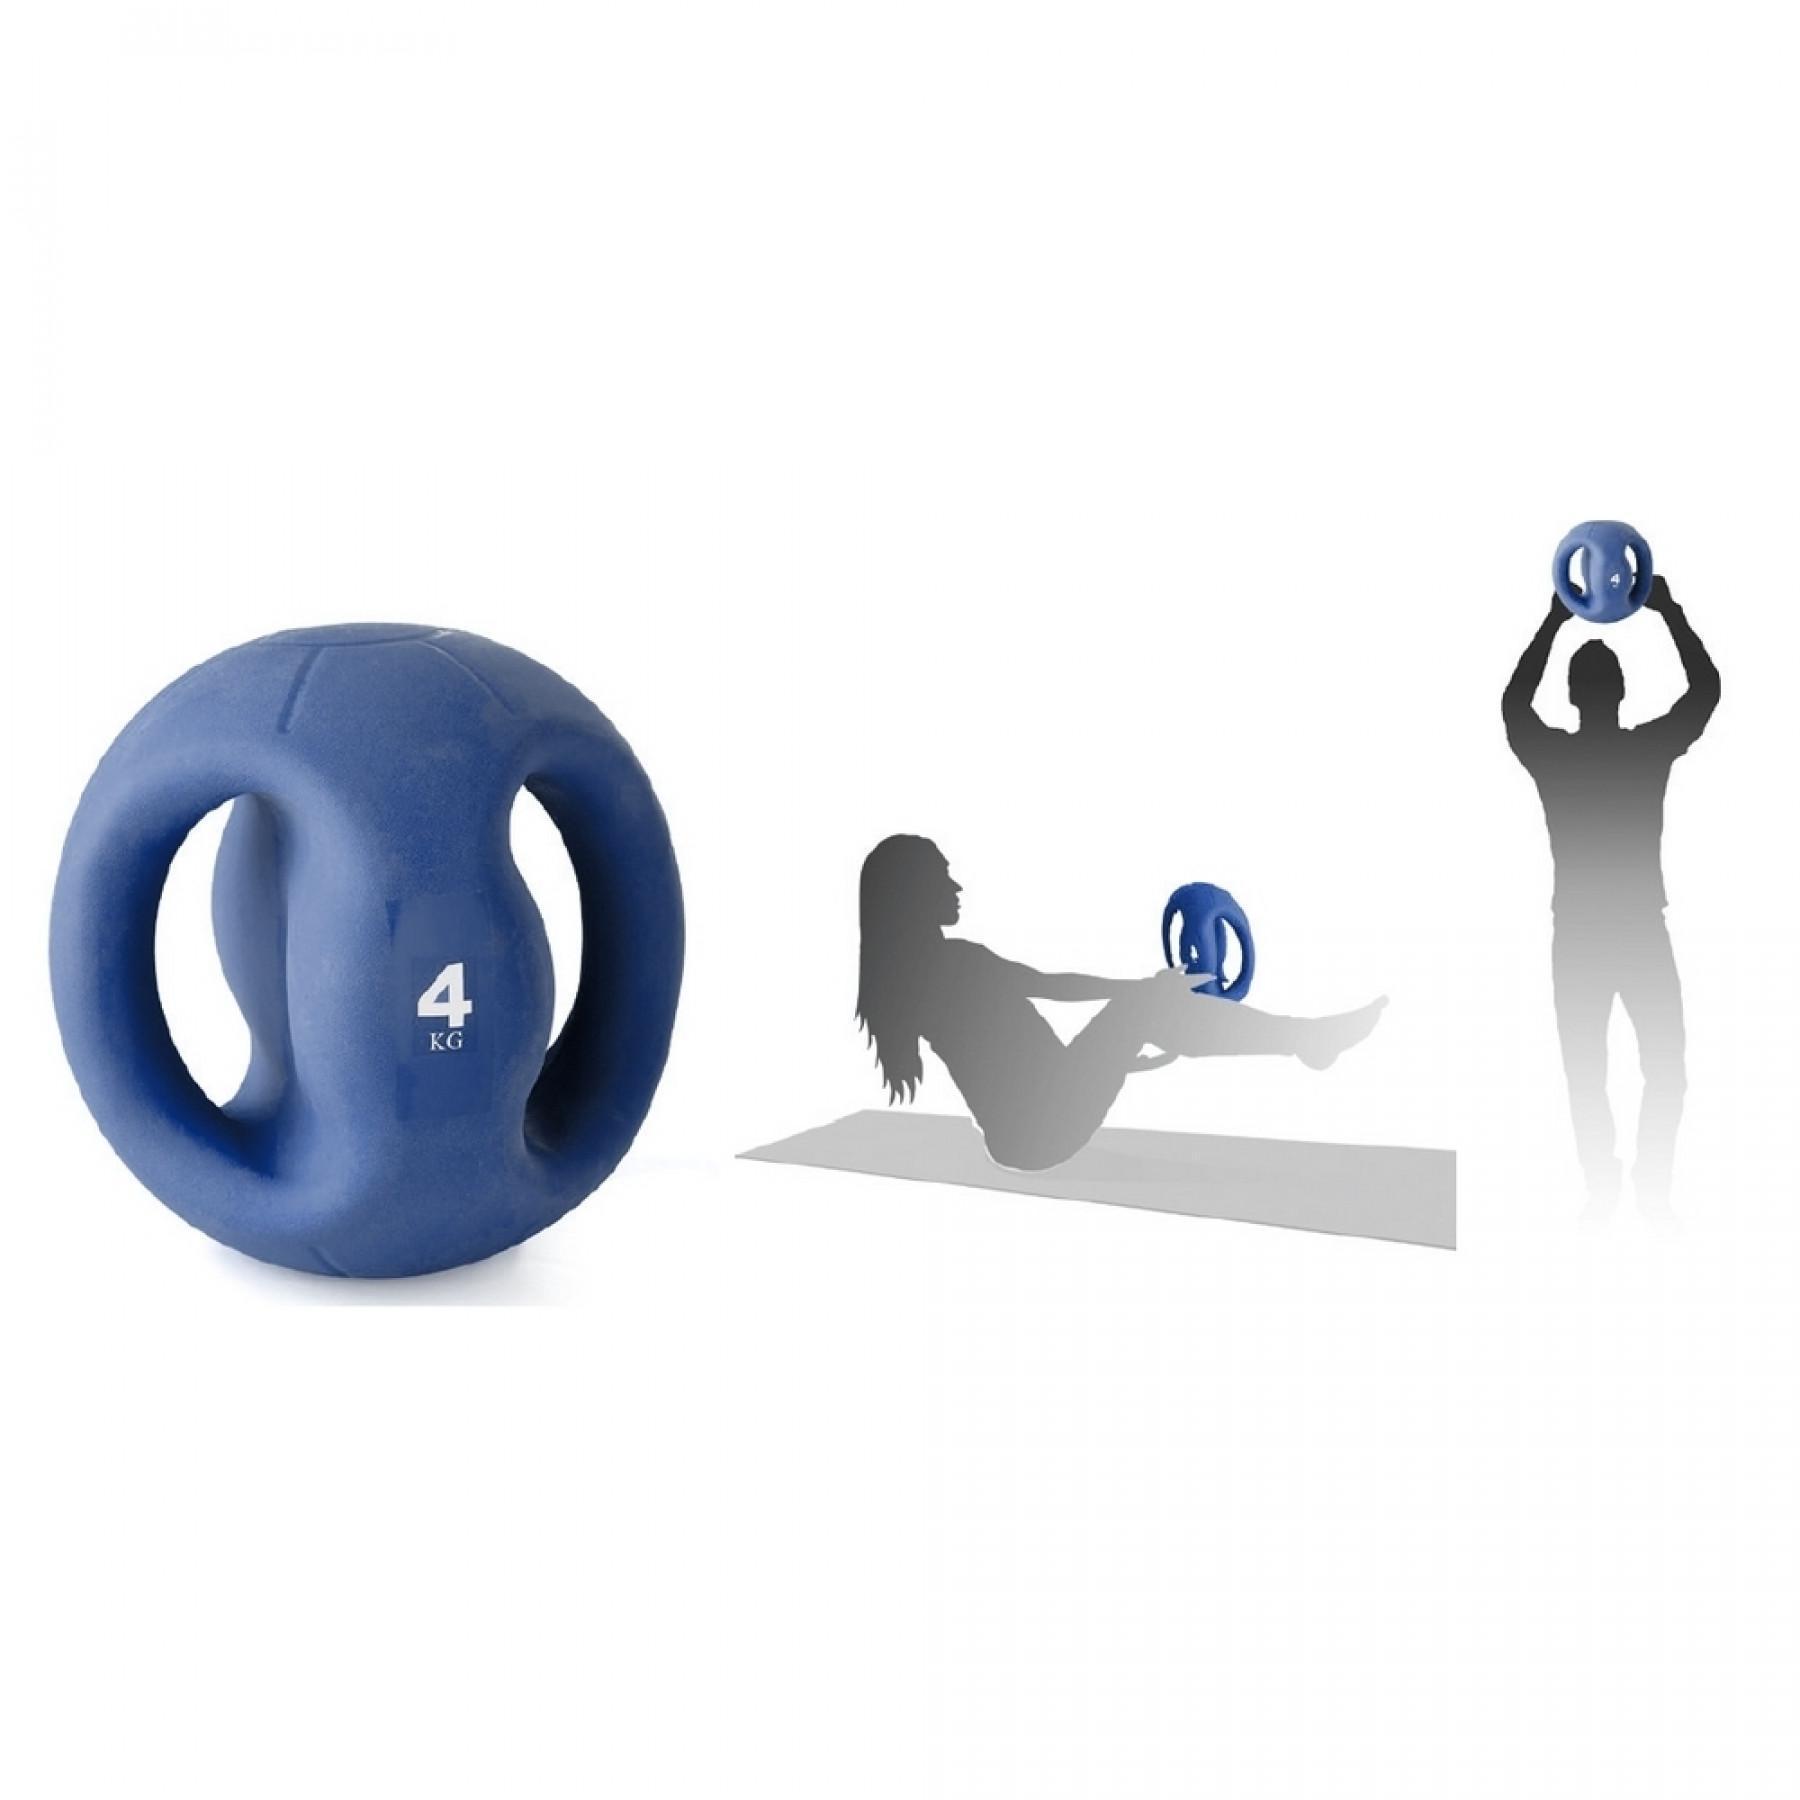 medecine-ball-avec-poignets-tremblay-4-kilos